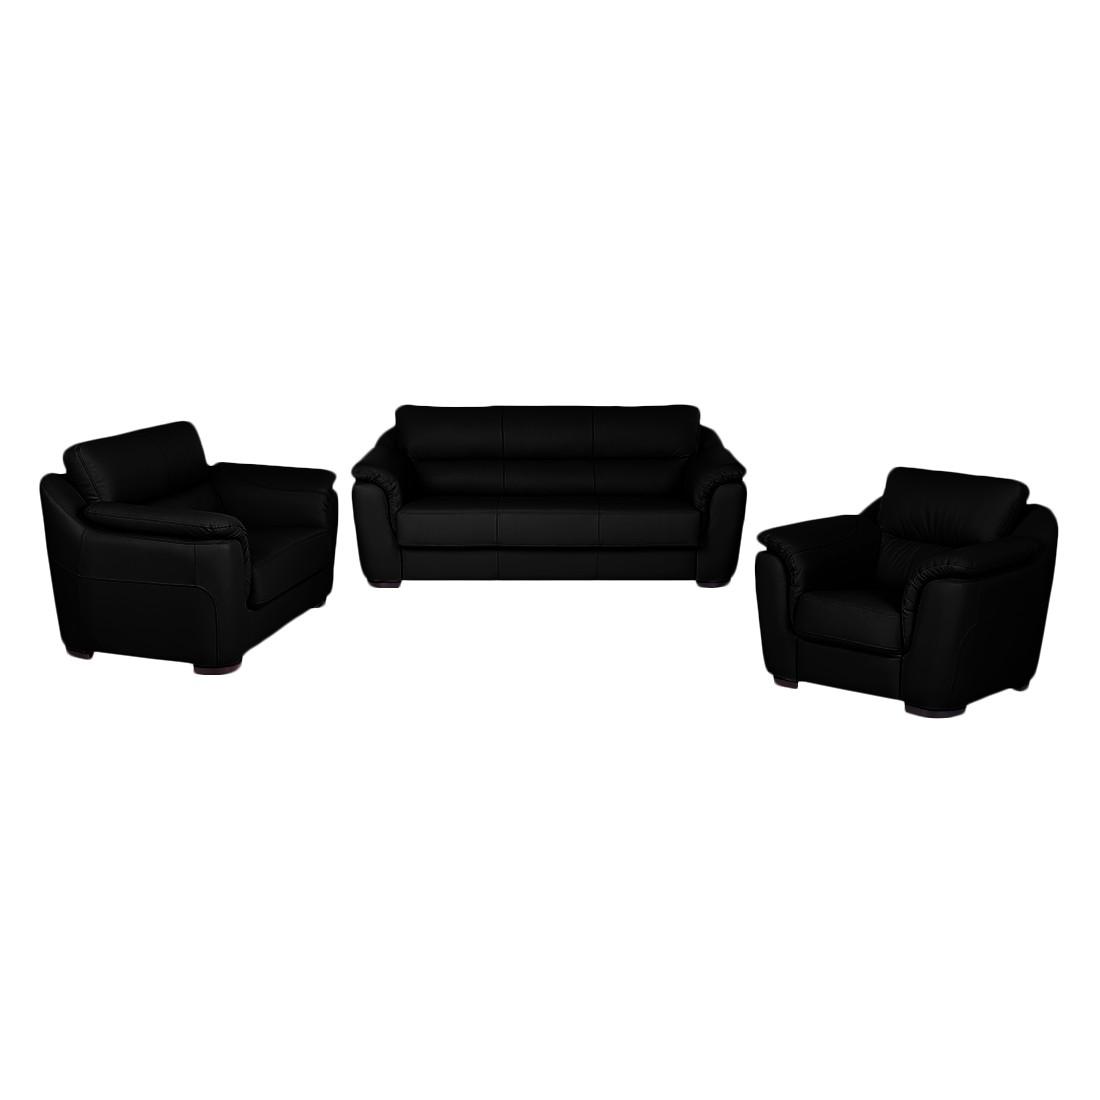 Canapé panoramique Alzira (3 -2 -1) - Cuir synthétique noir, Nuovoform